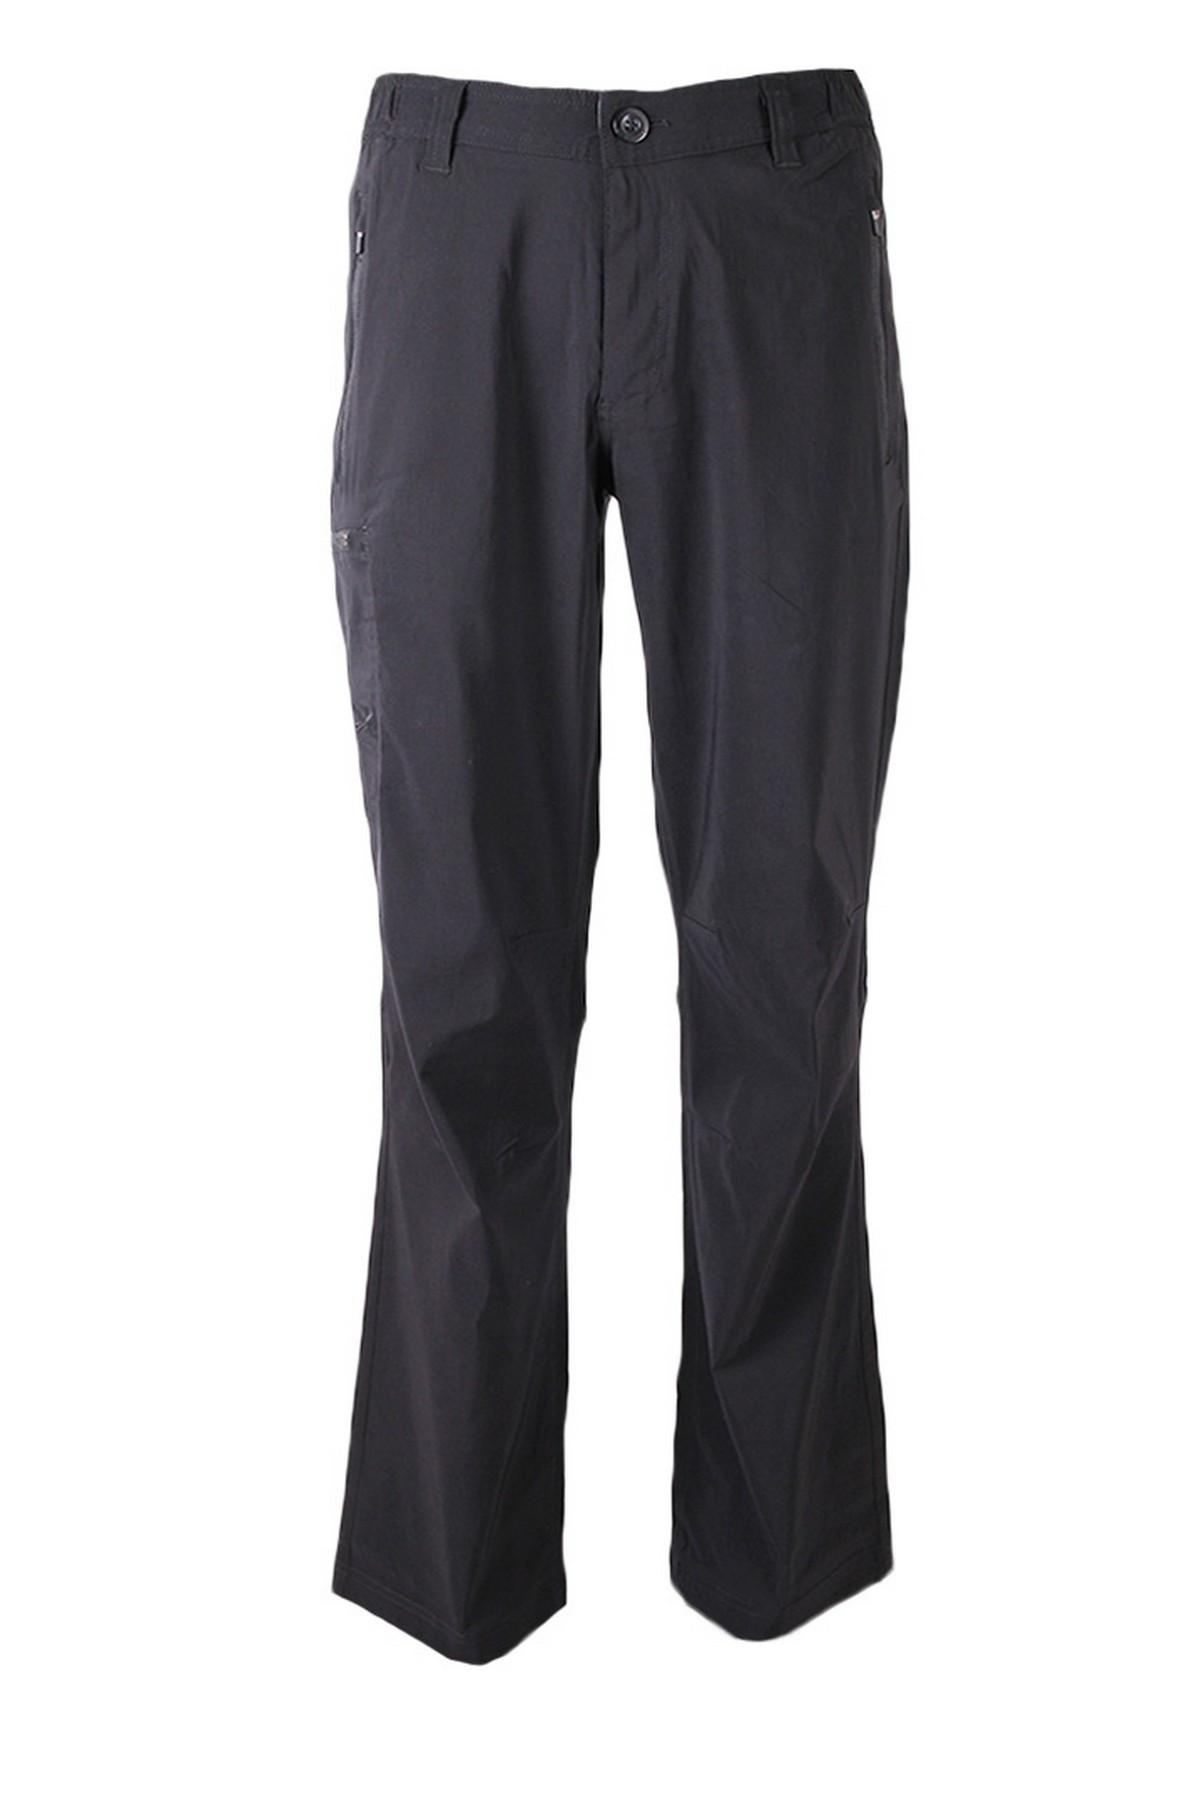 Karrimor Stretch Erkek Pantolonu Siyah (KC441066-BLK-413)